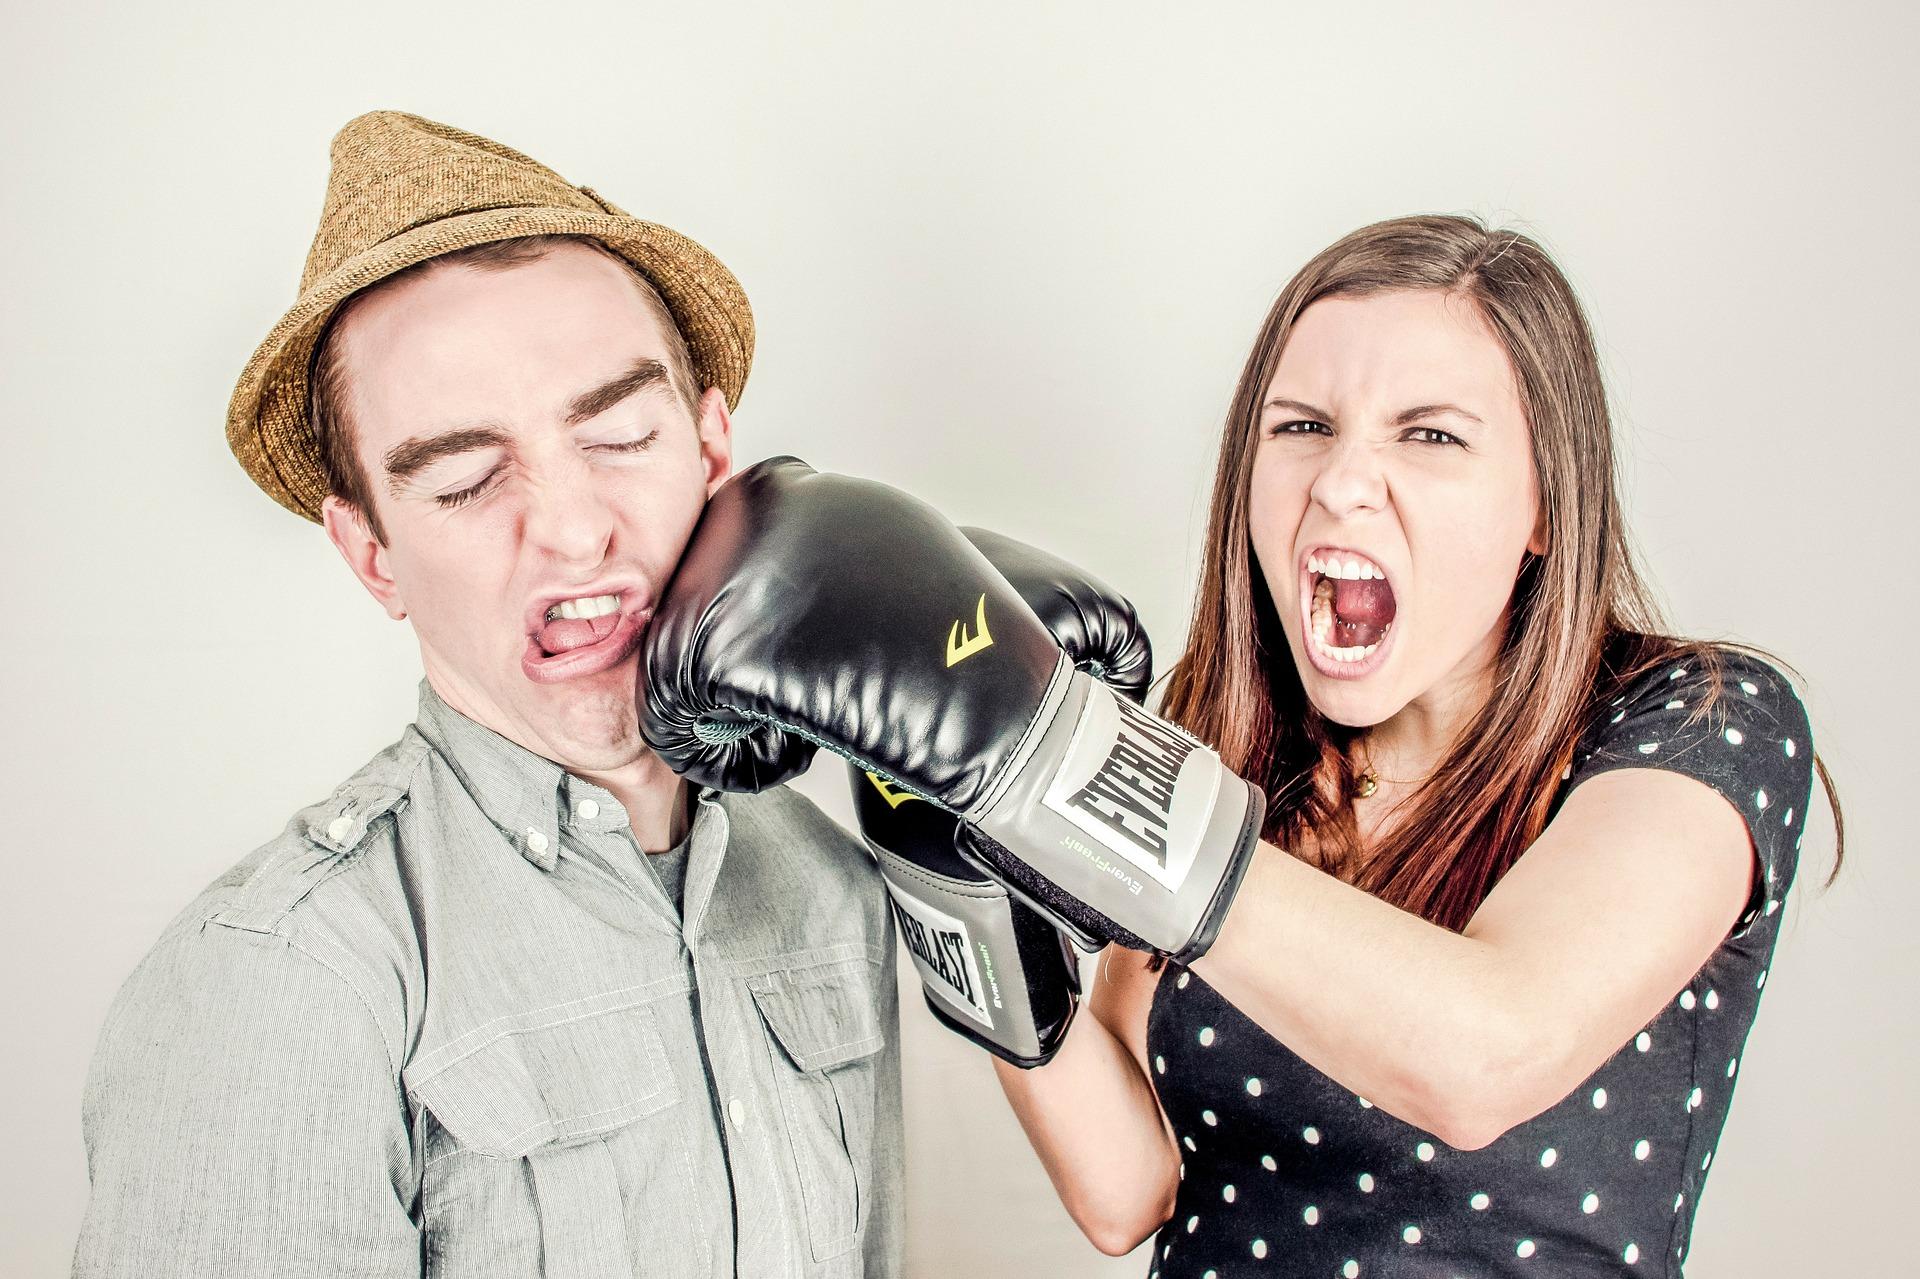 ljubavna svađa, borba muža i žene,